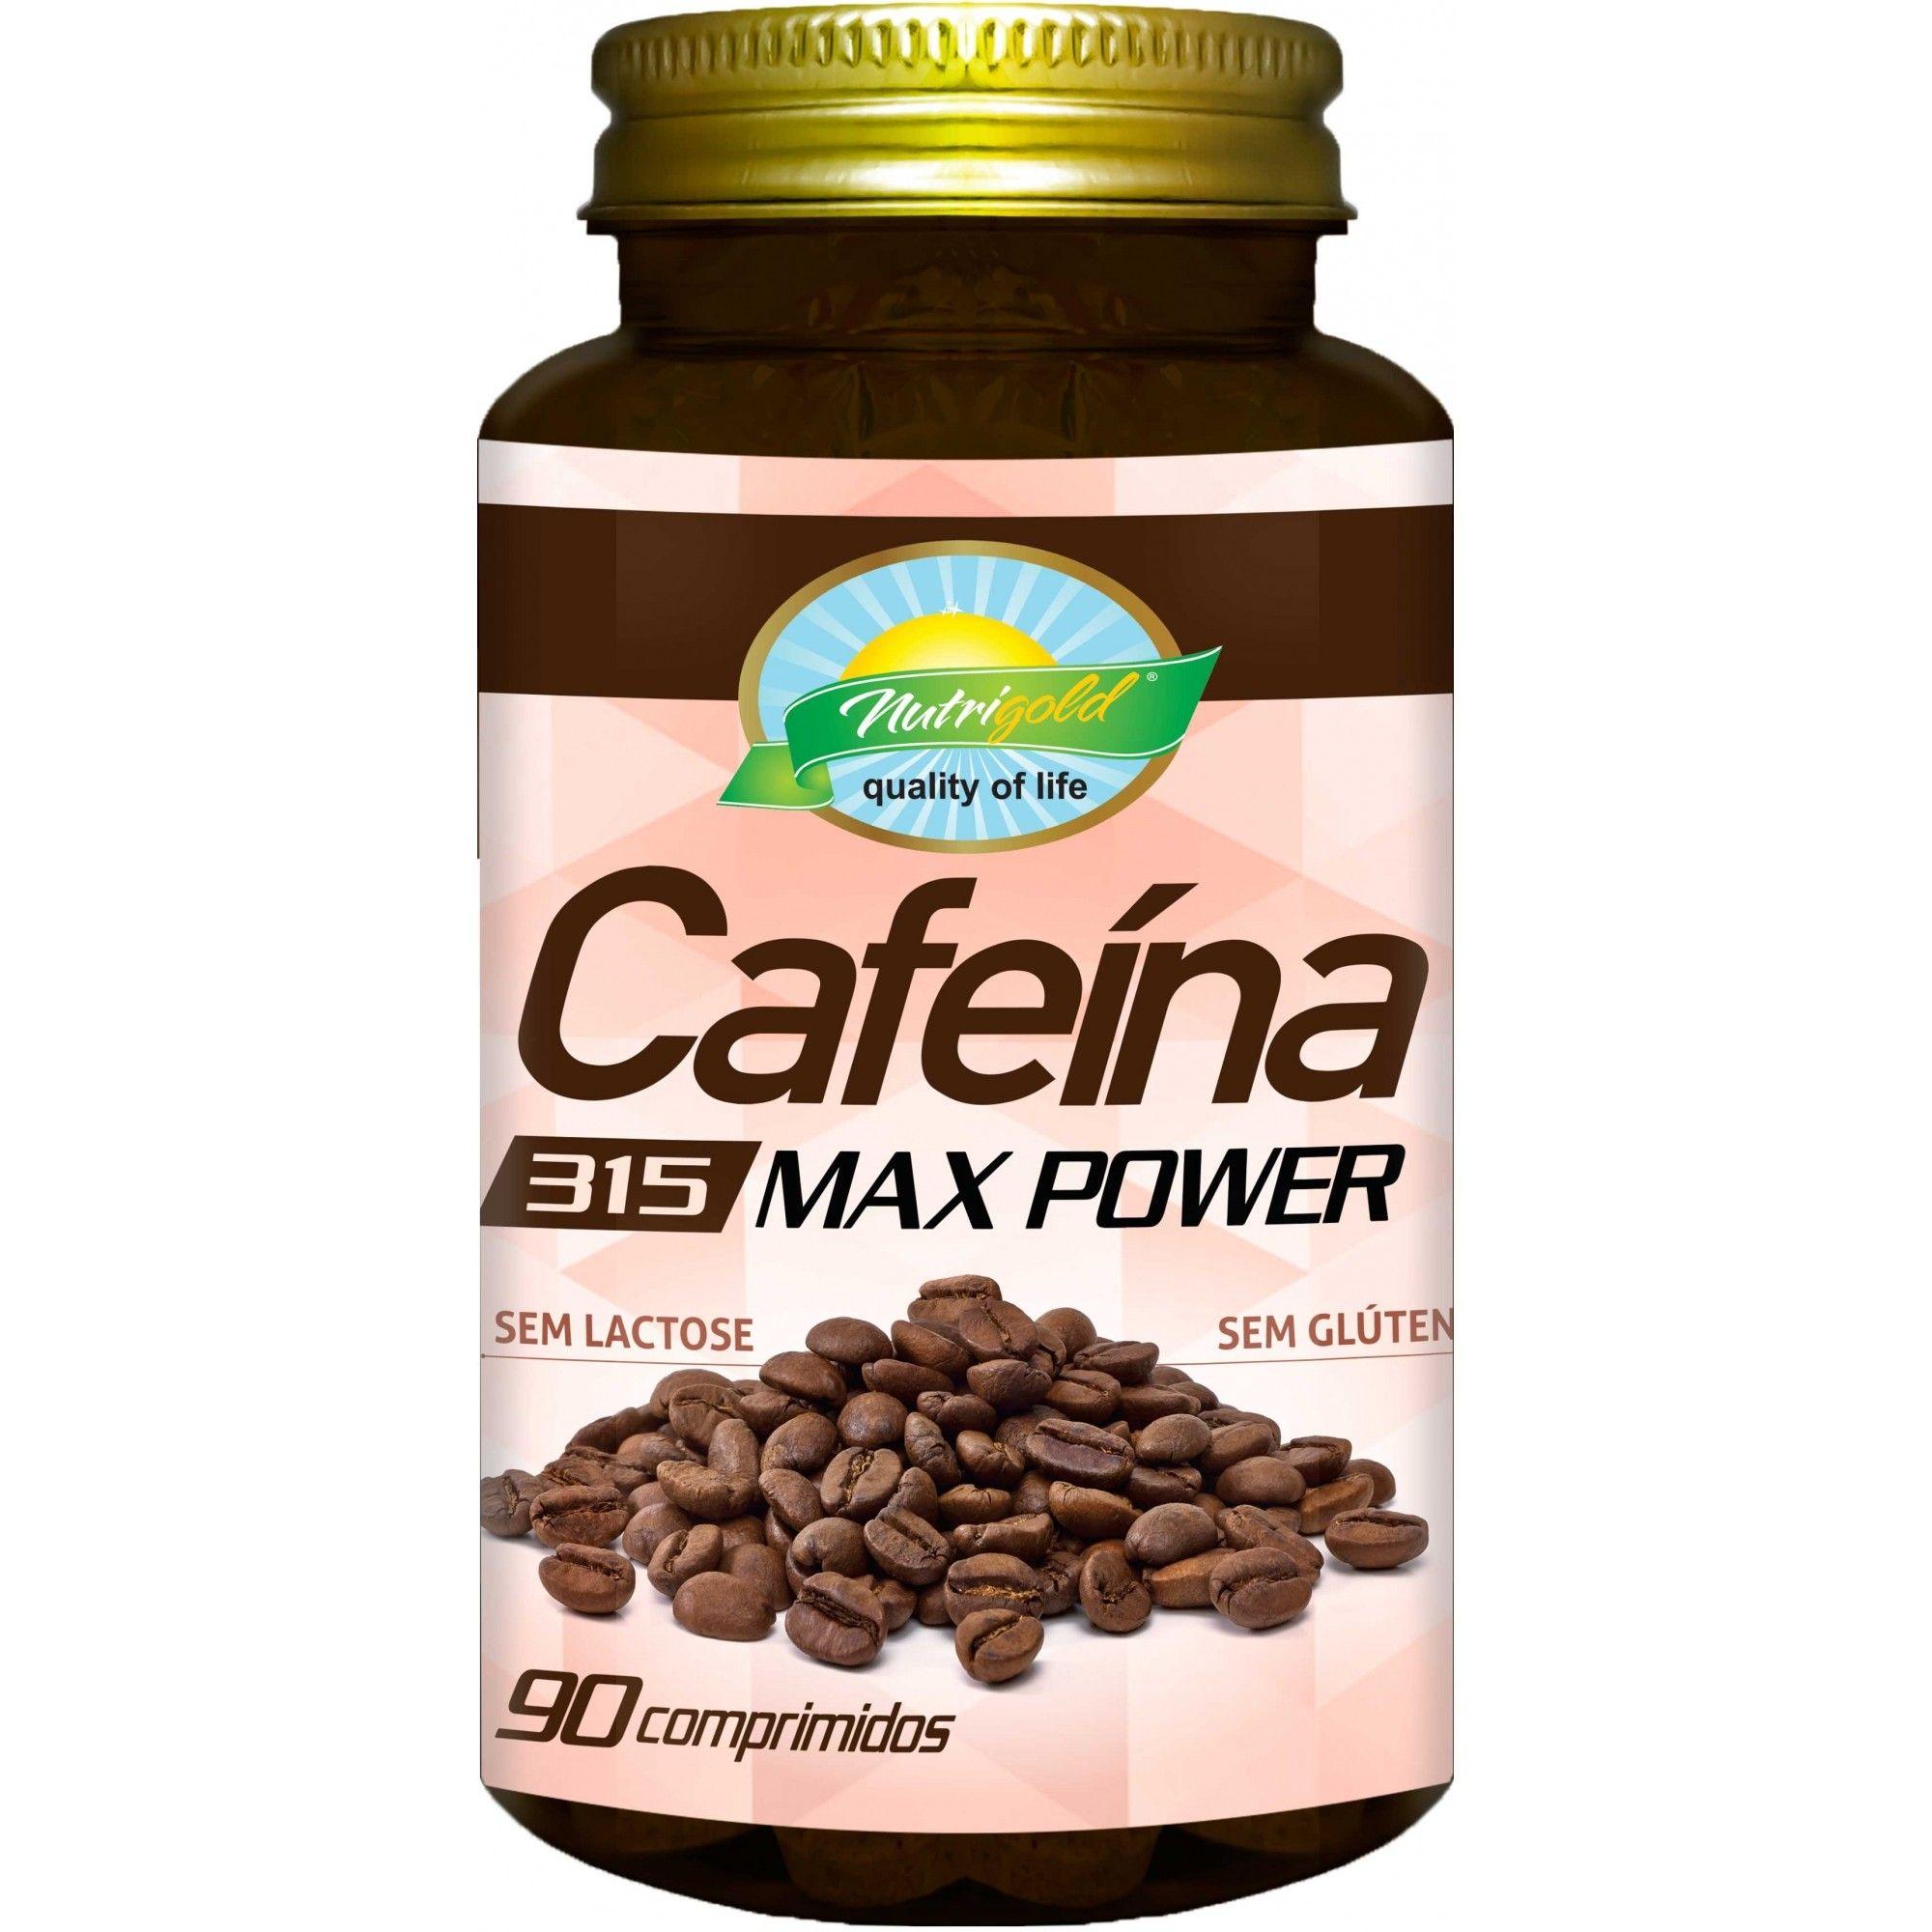 Kit 3 Cafeína 90 Comprimidos 315mg  Max Power